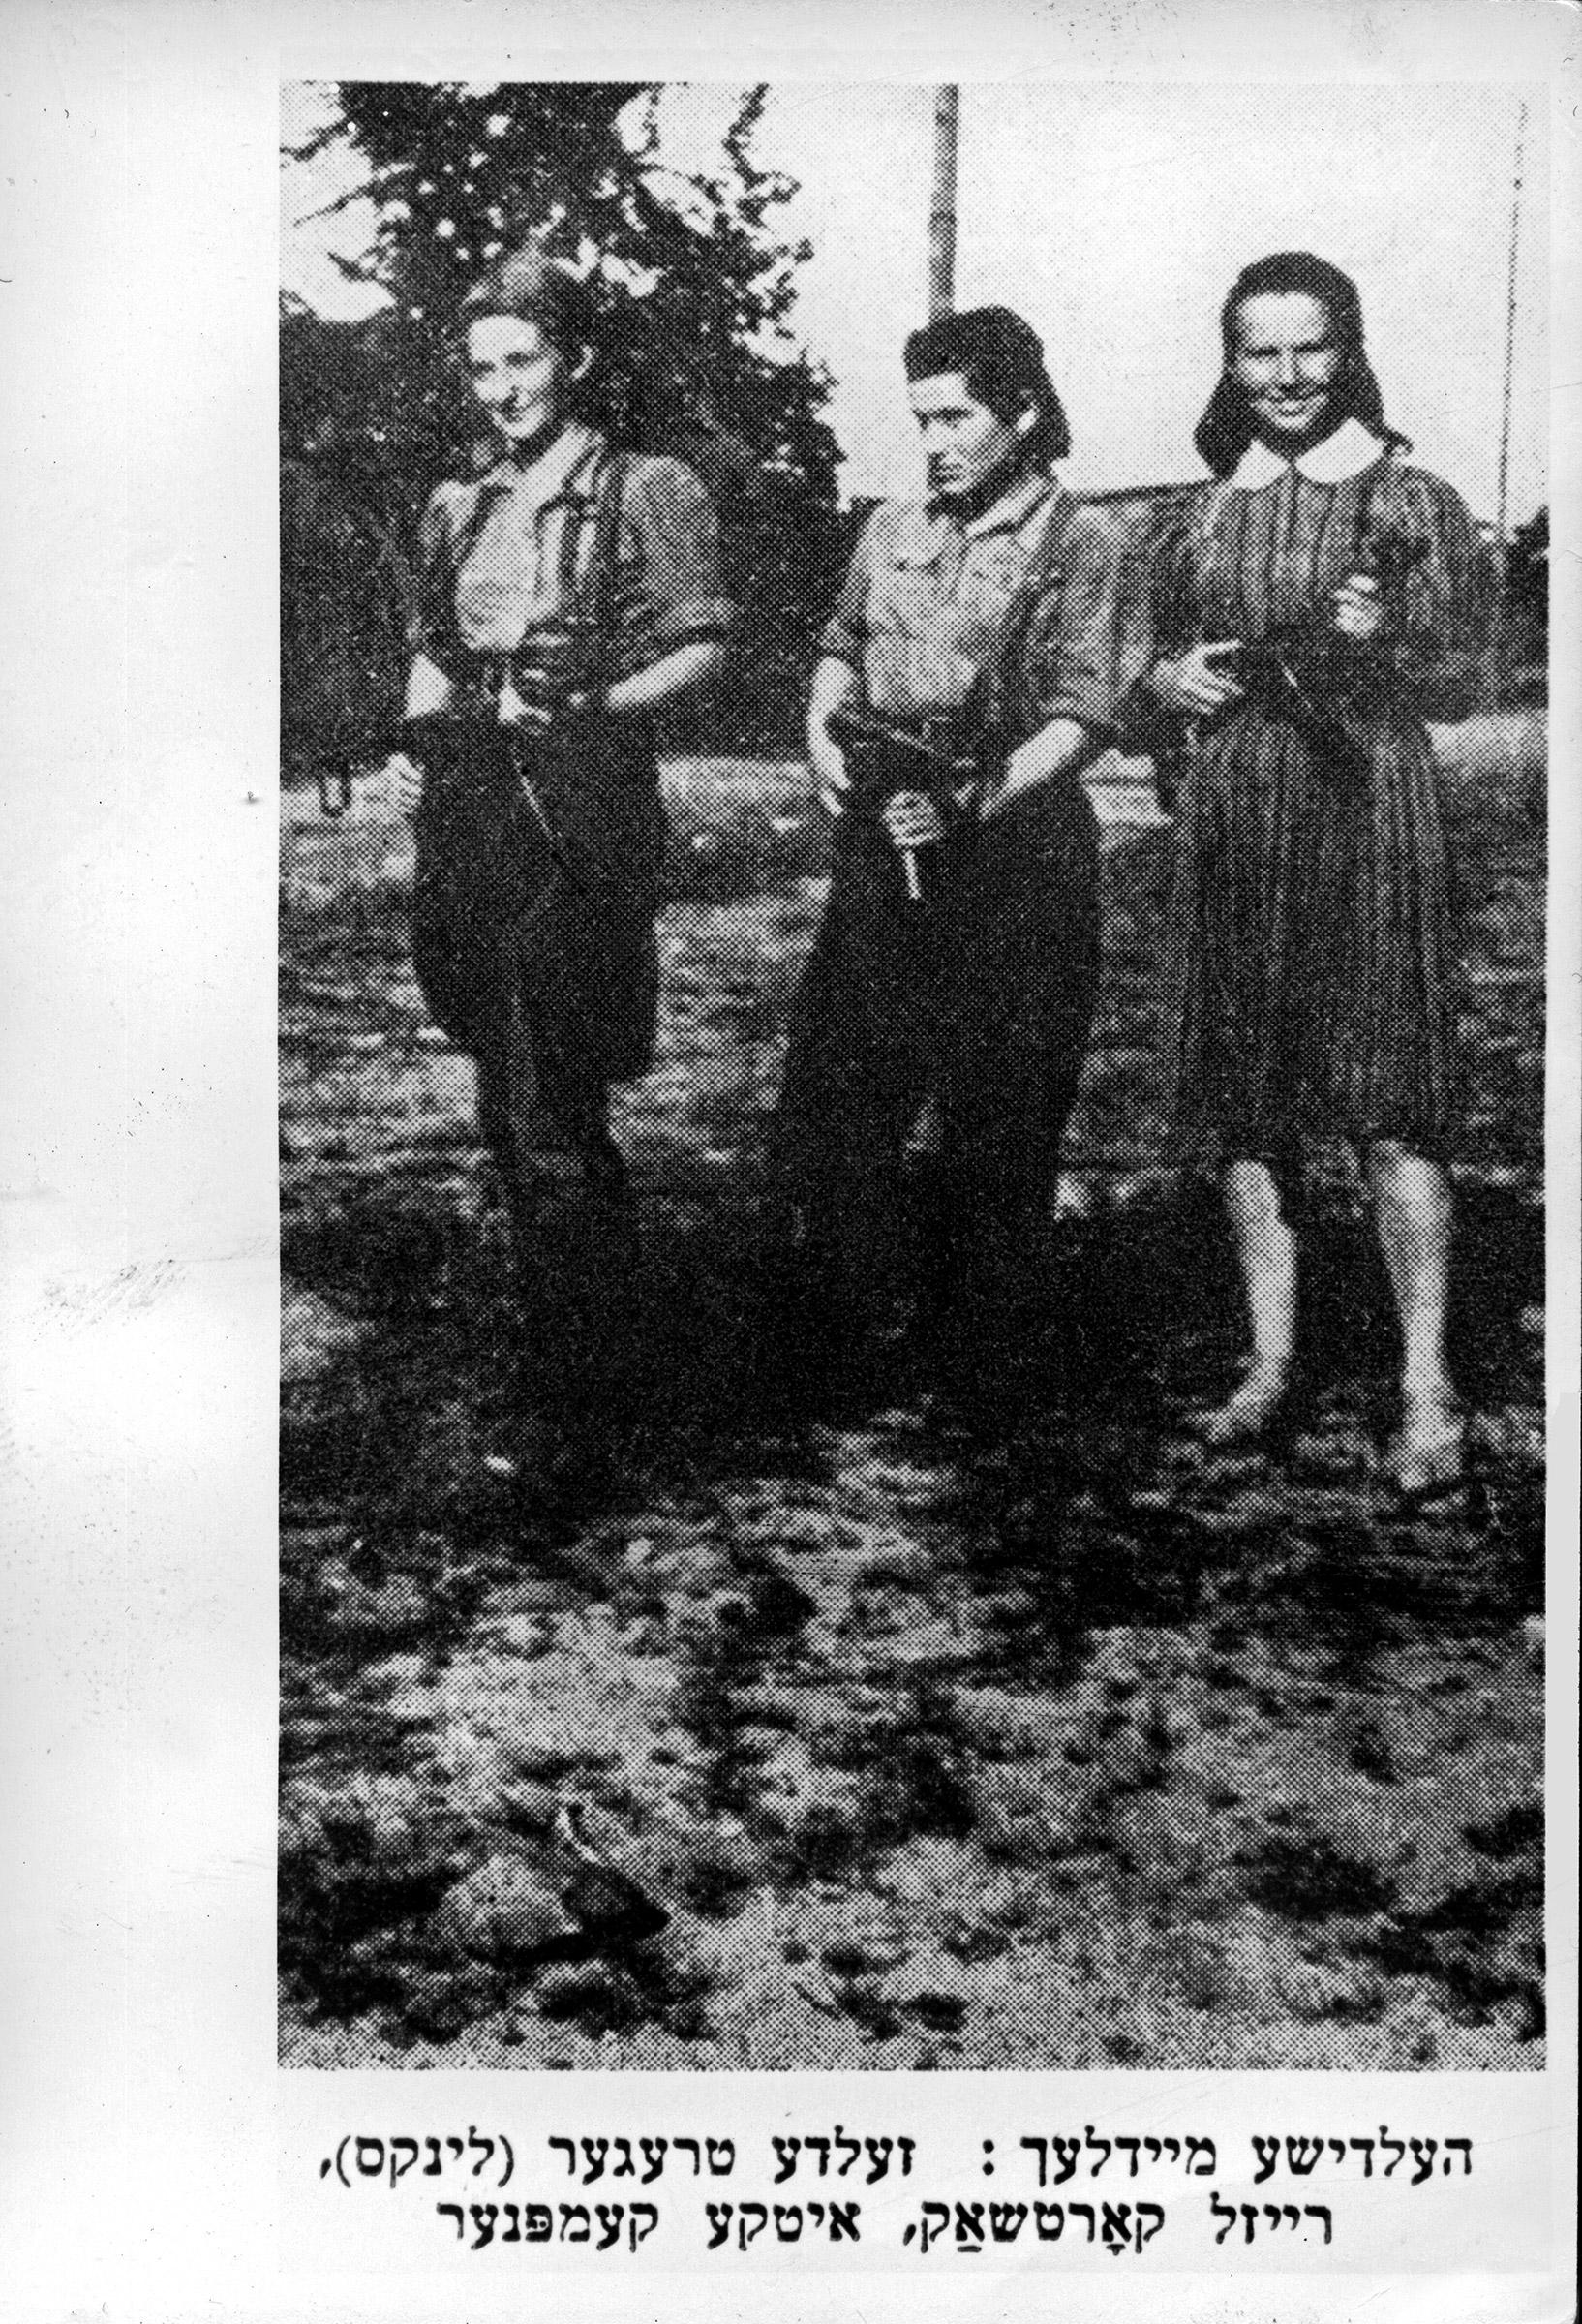 Left to right: Vitka Kempner, Ruzka Korczak, and Zelda Treger.